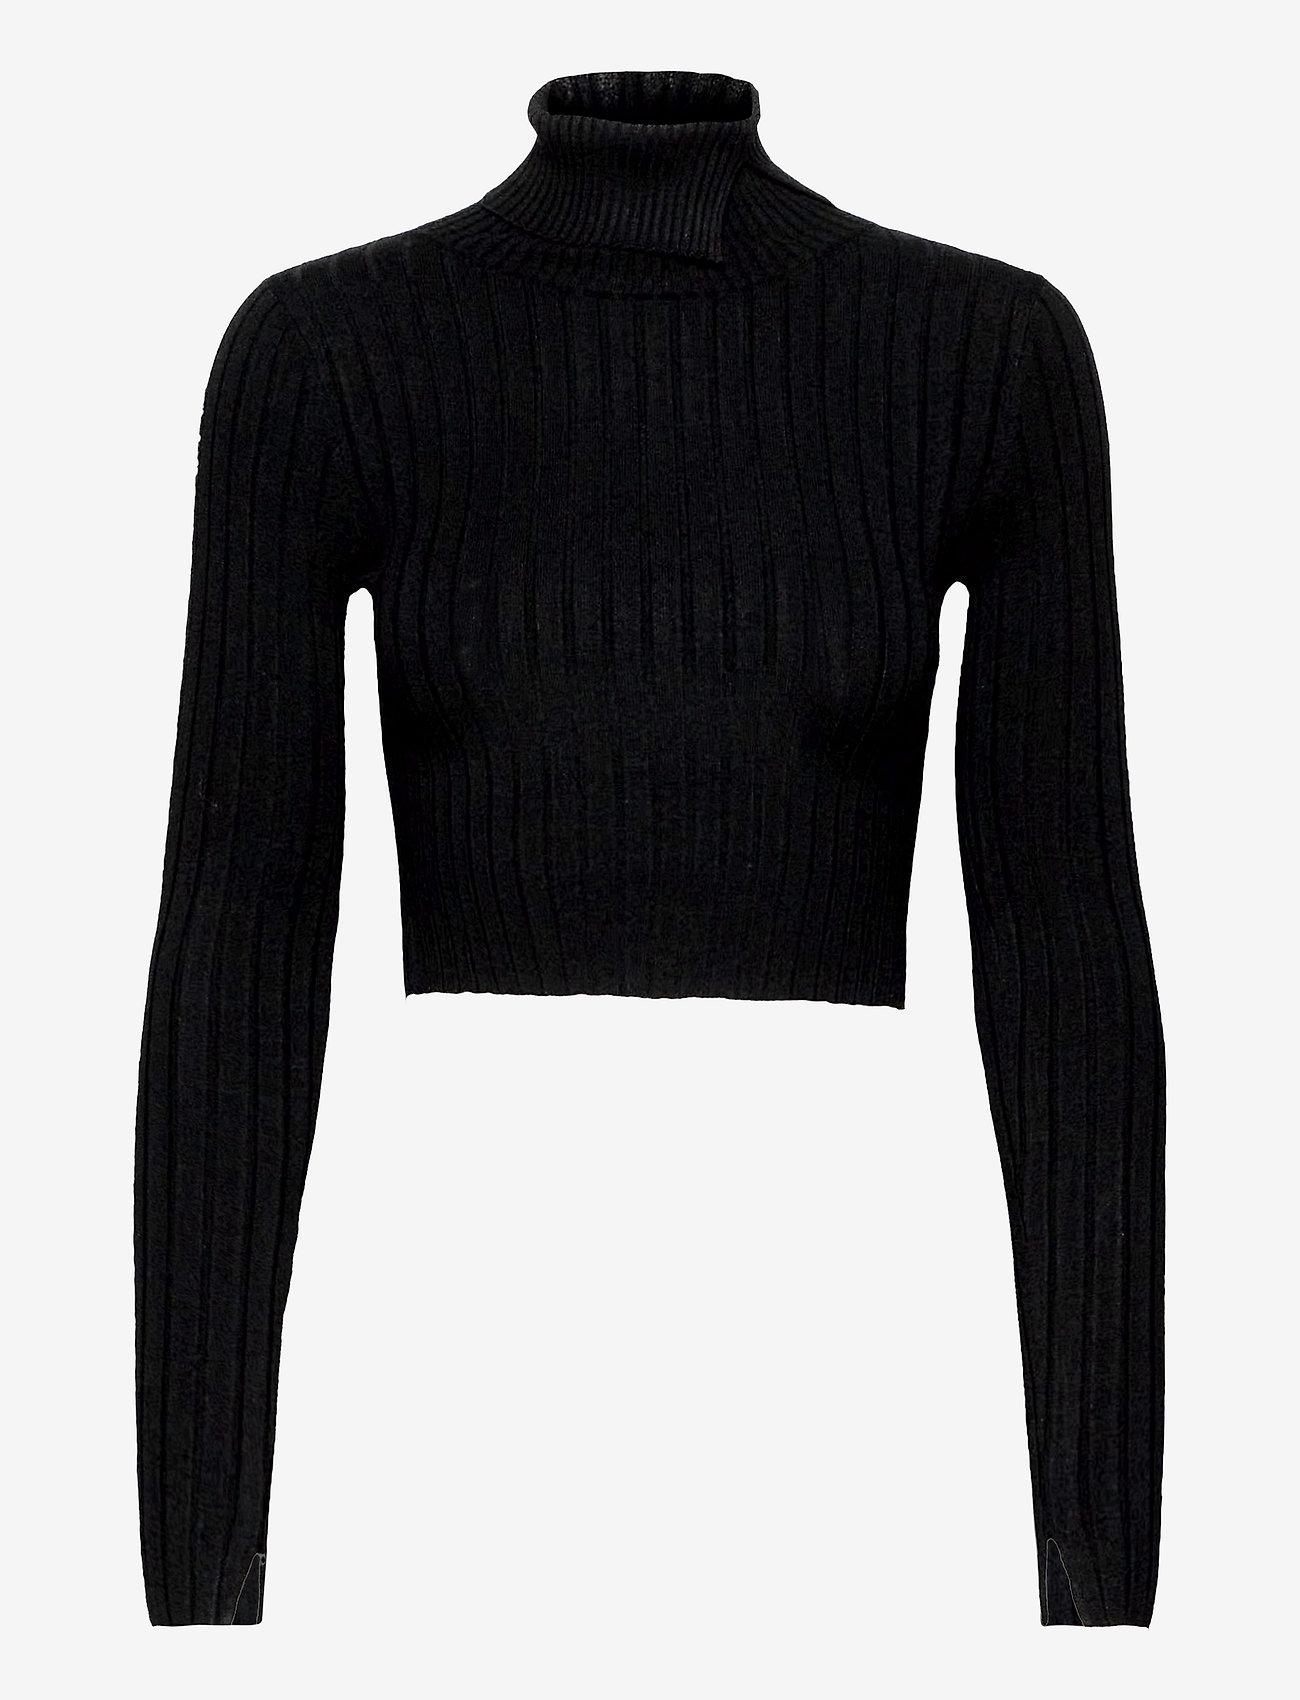 AllSaints - SIGOURNEY TYDY DRESS - evening dresses - black - 4